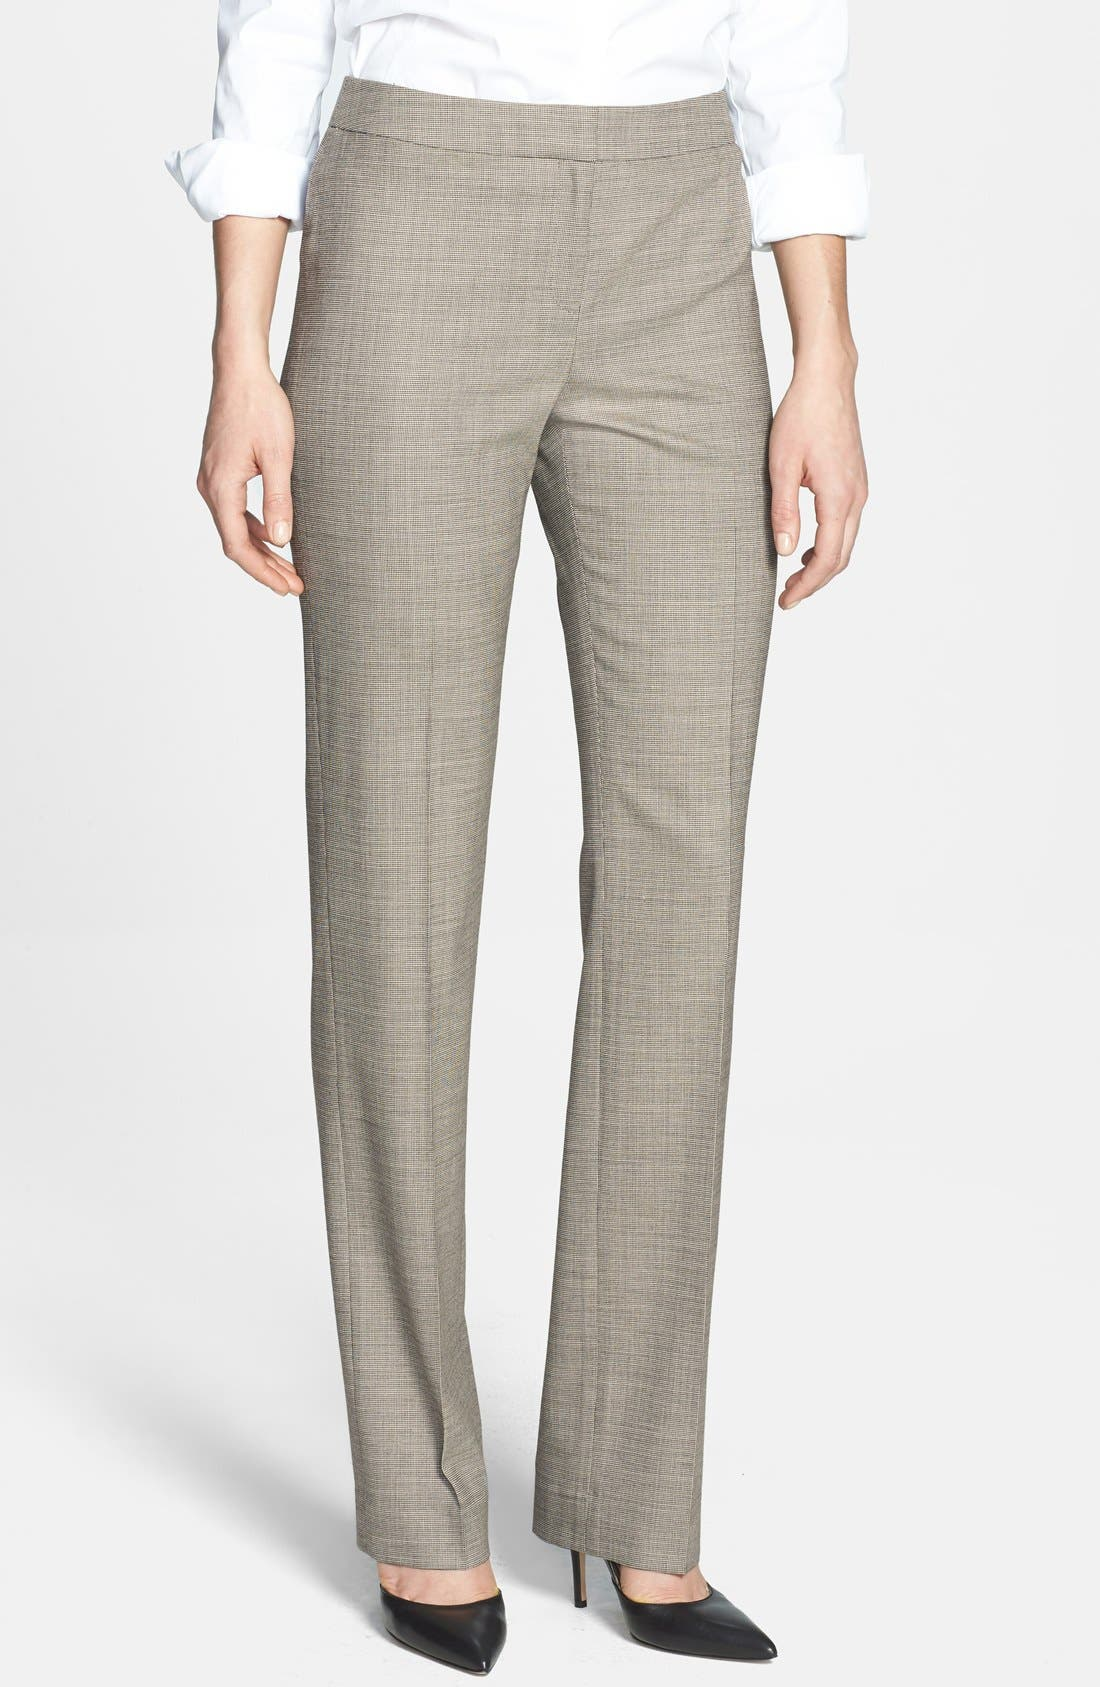 Alternate Image 1 Selected - Lafayette 148 New York 'Barrow - Ritz' Suiting Pants (Regular & Petite)